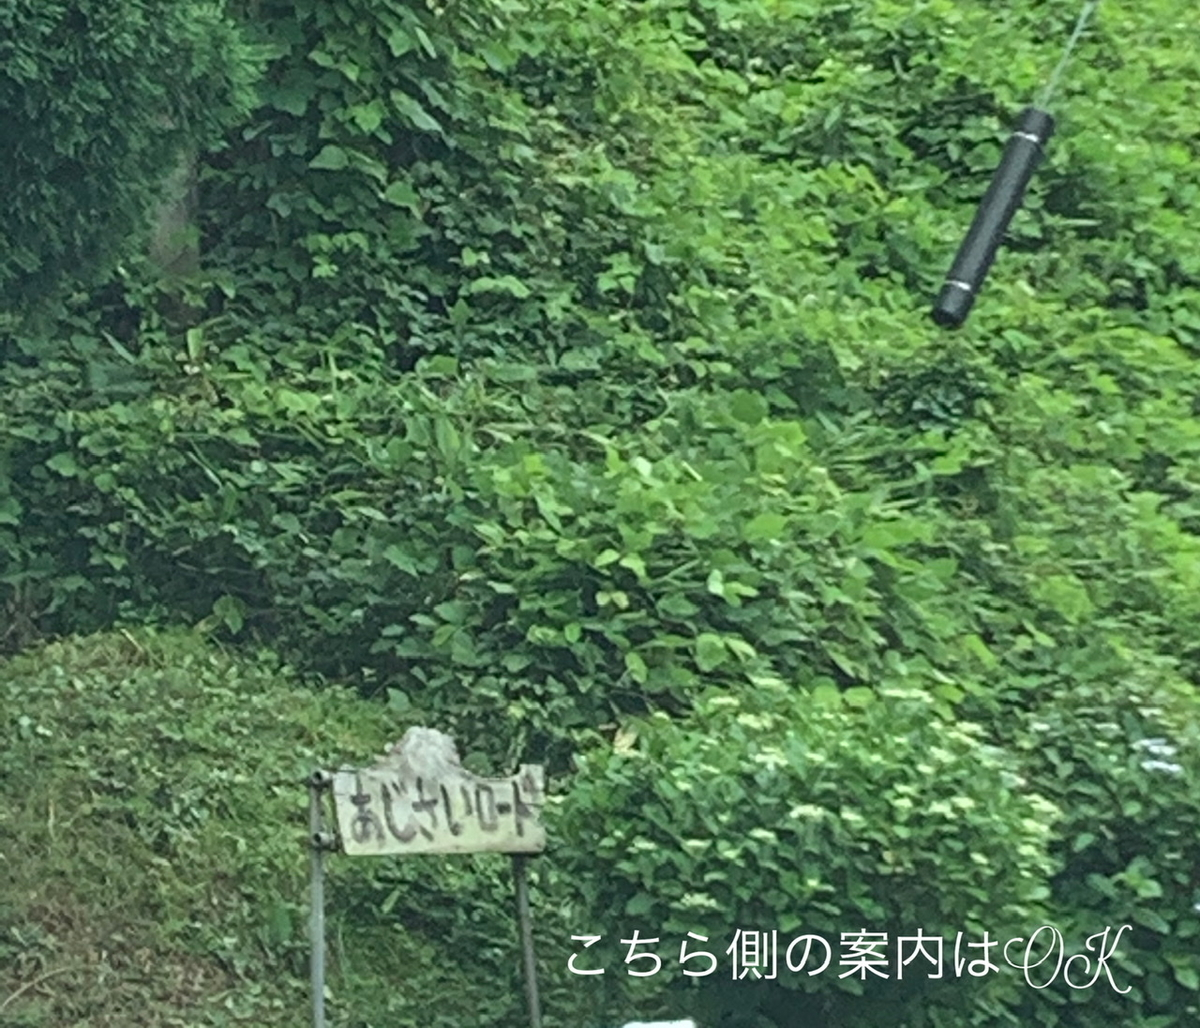 f:id:karutakko-muratan:20200706102114j:plain